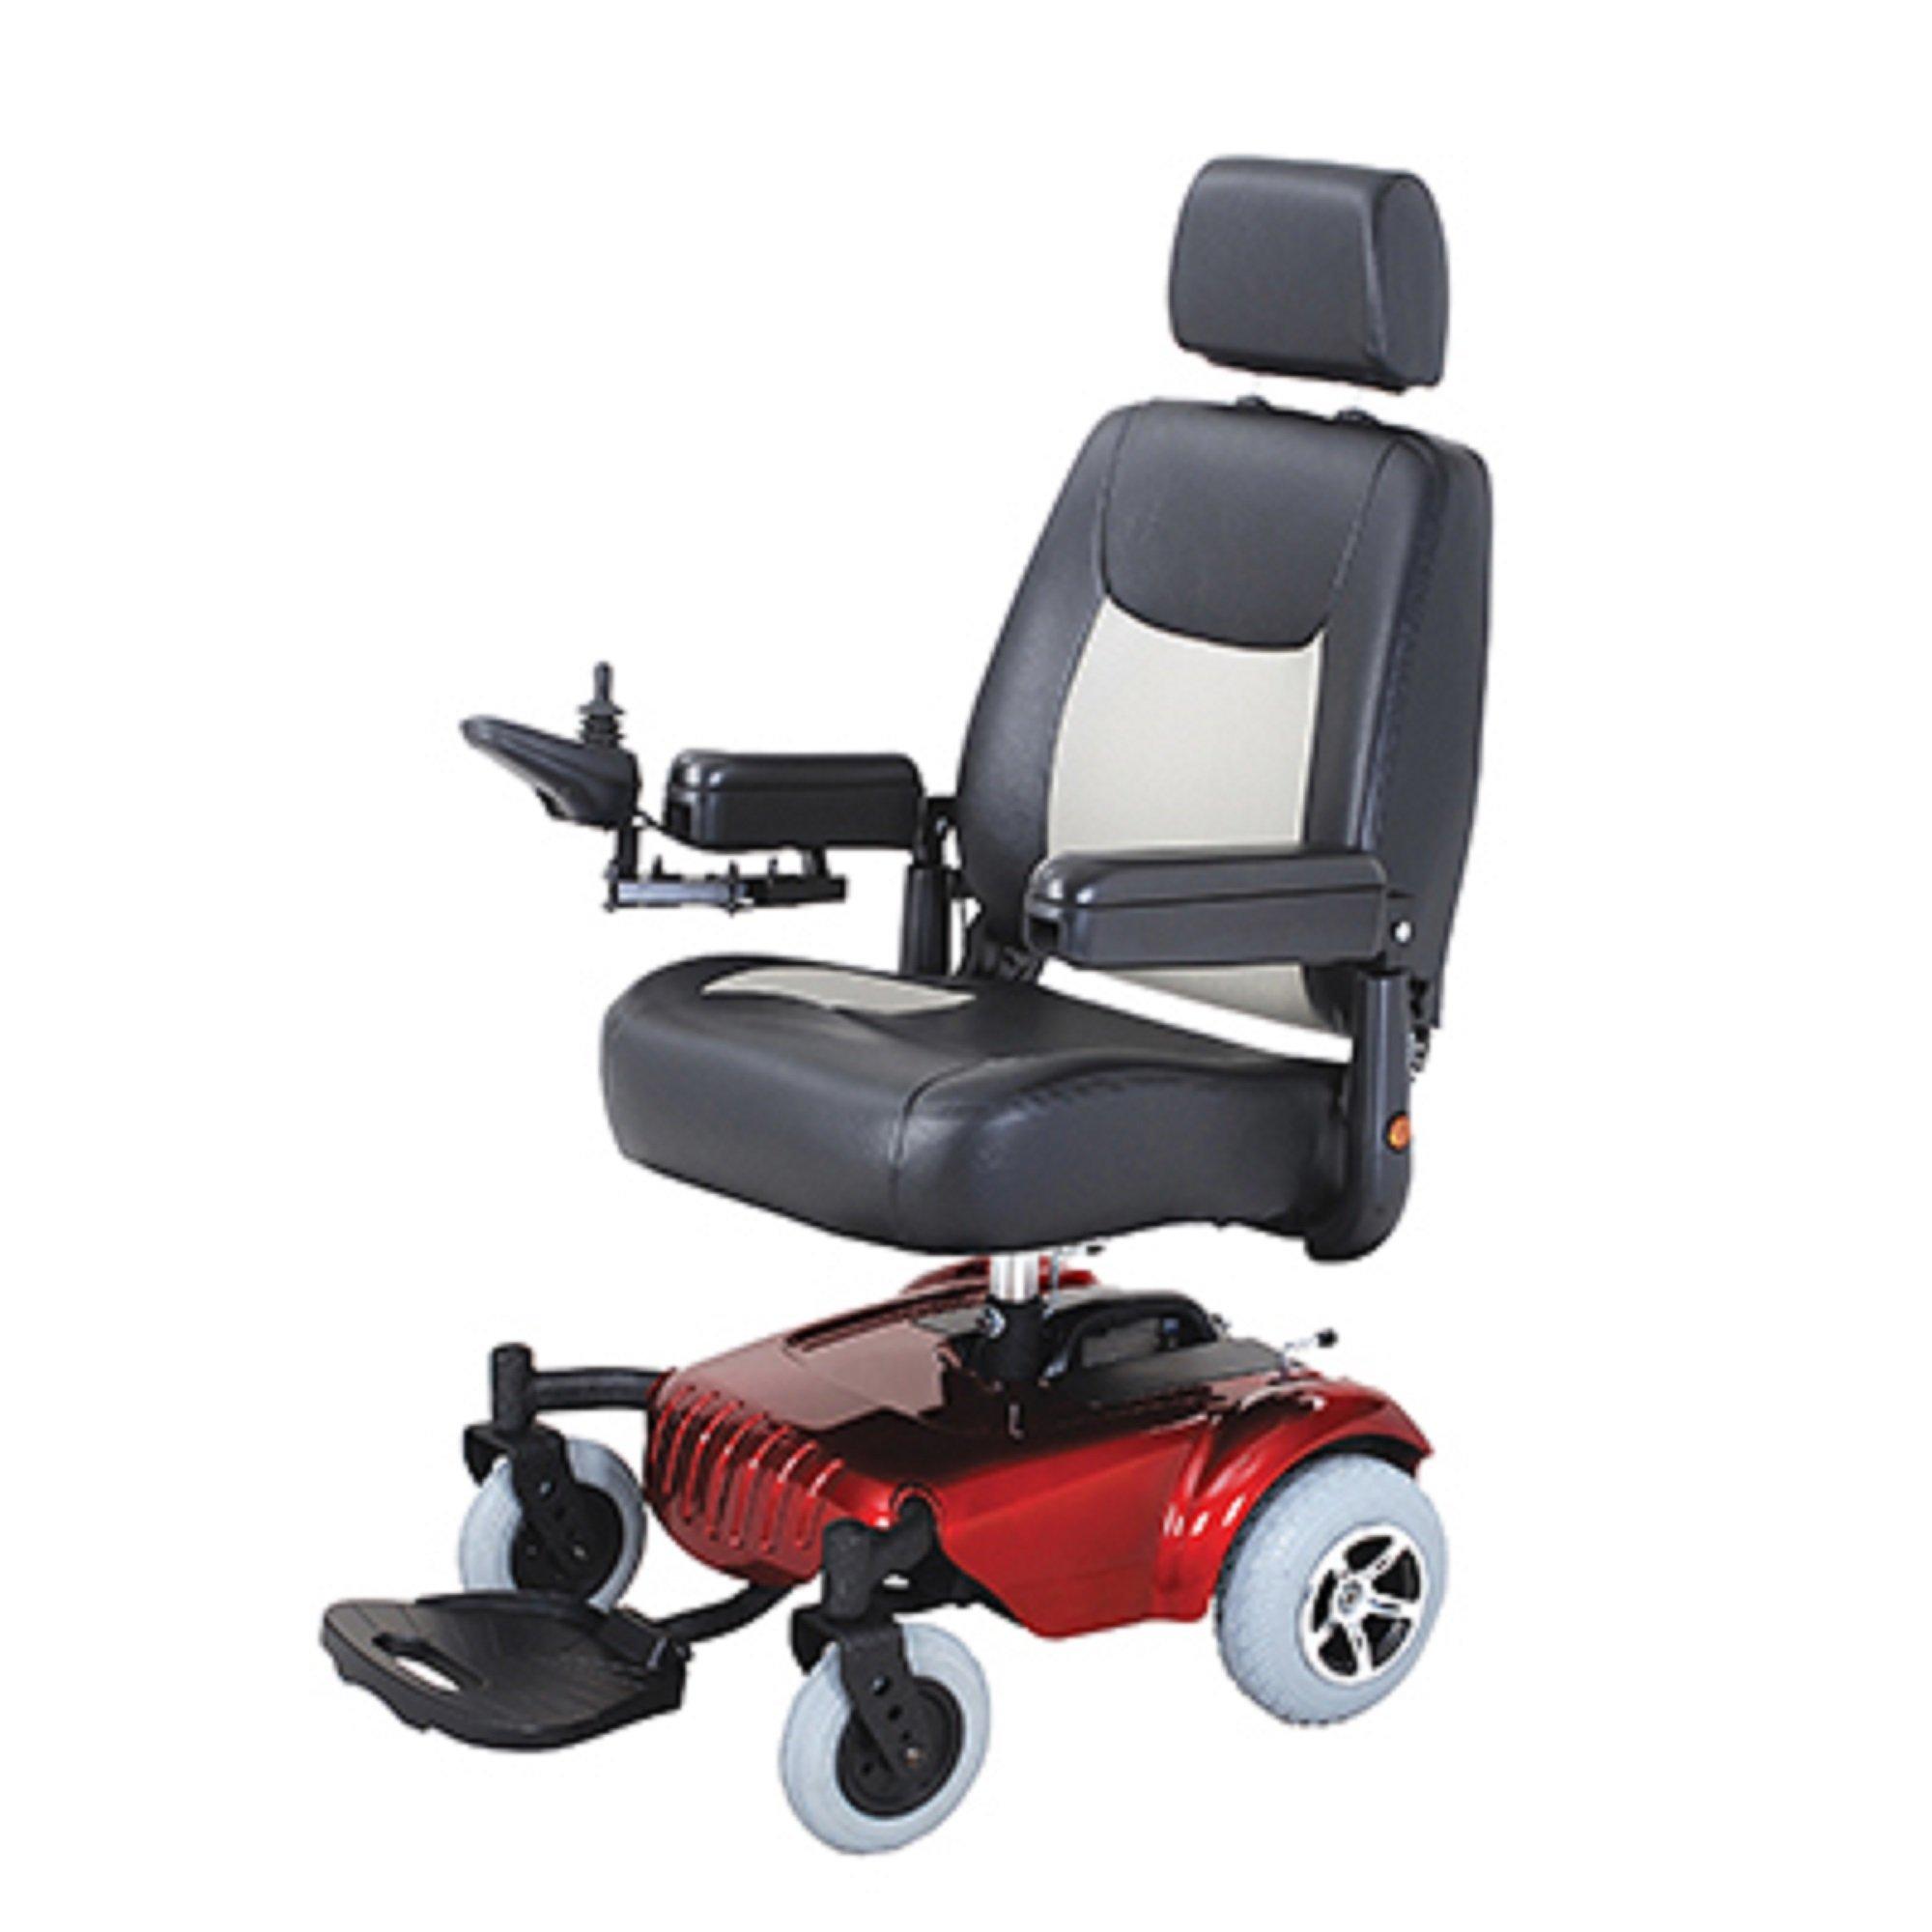 Merits Health Products - Junior - Super Light Mini RWD Power Chair - 19''W x 18''D - Red